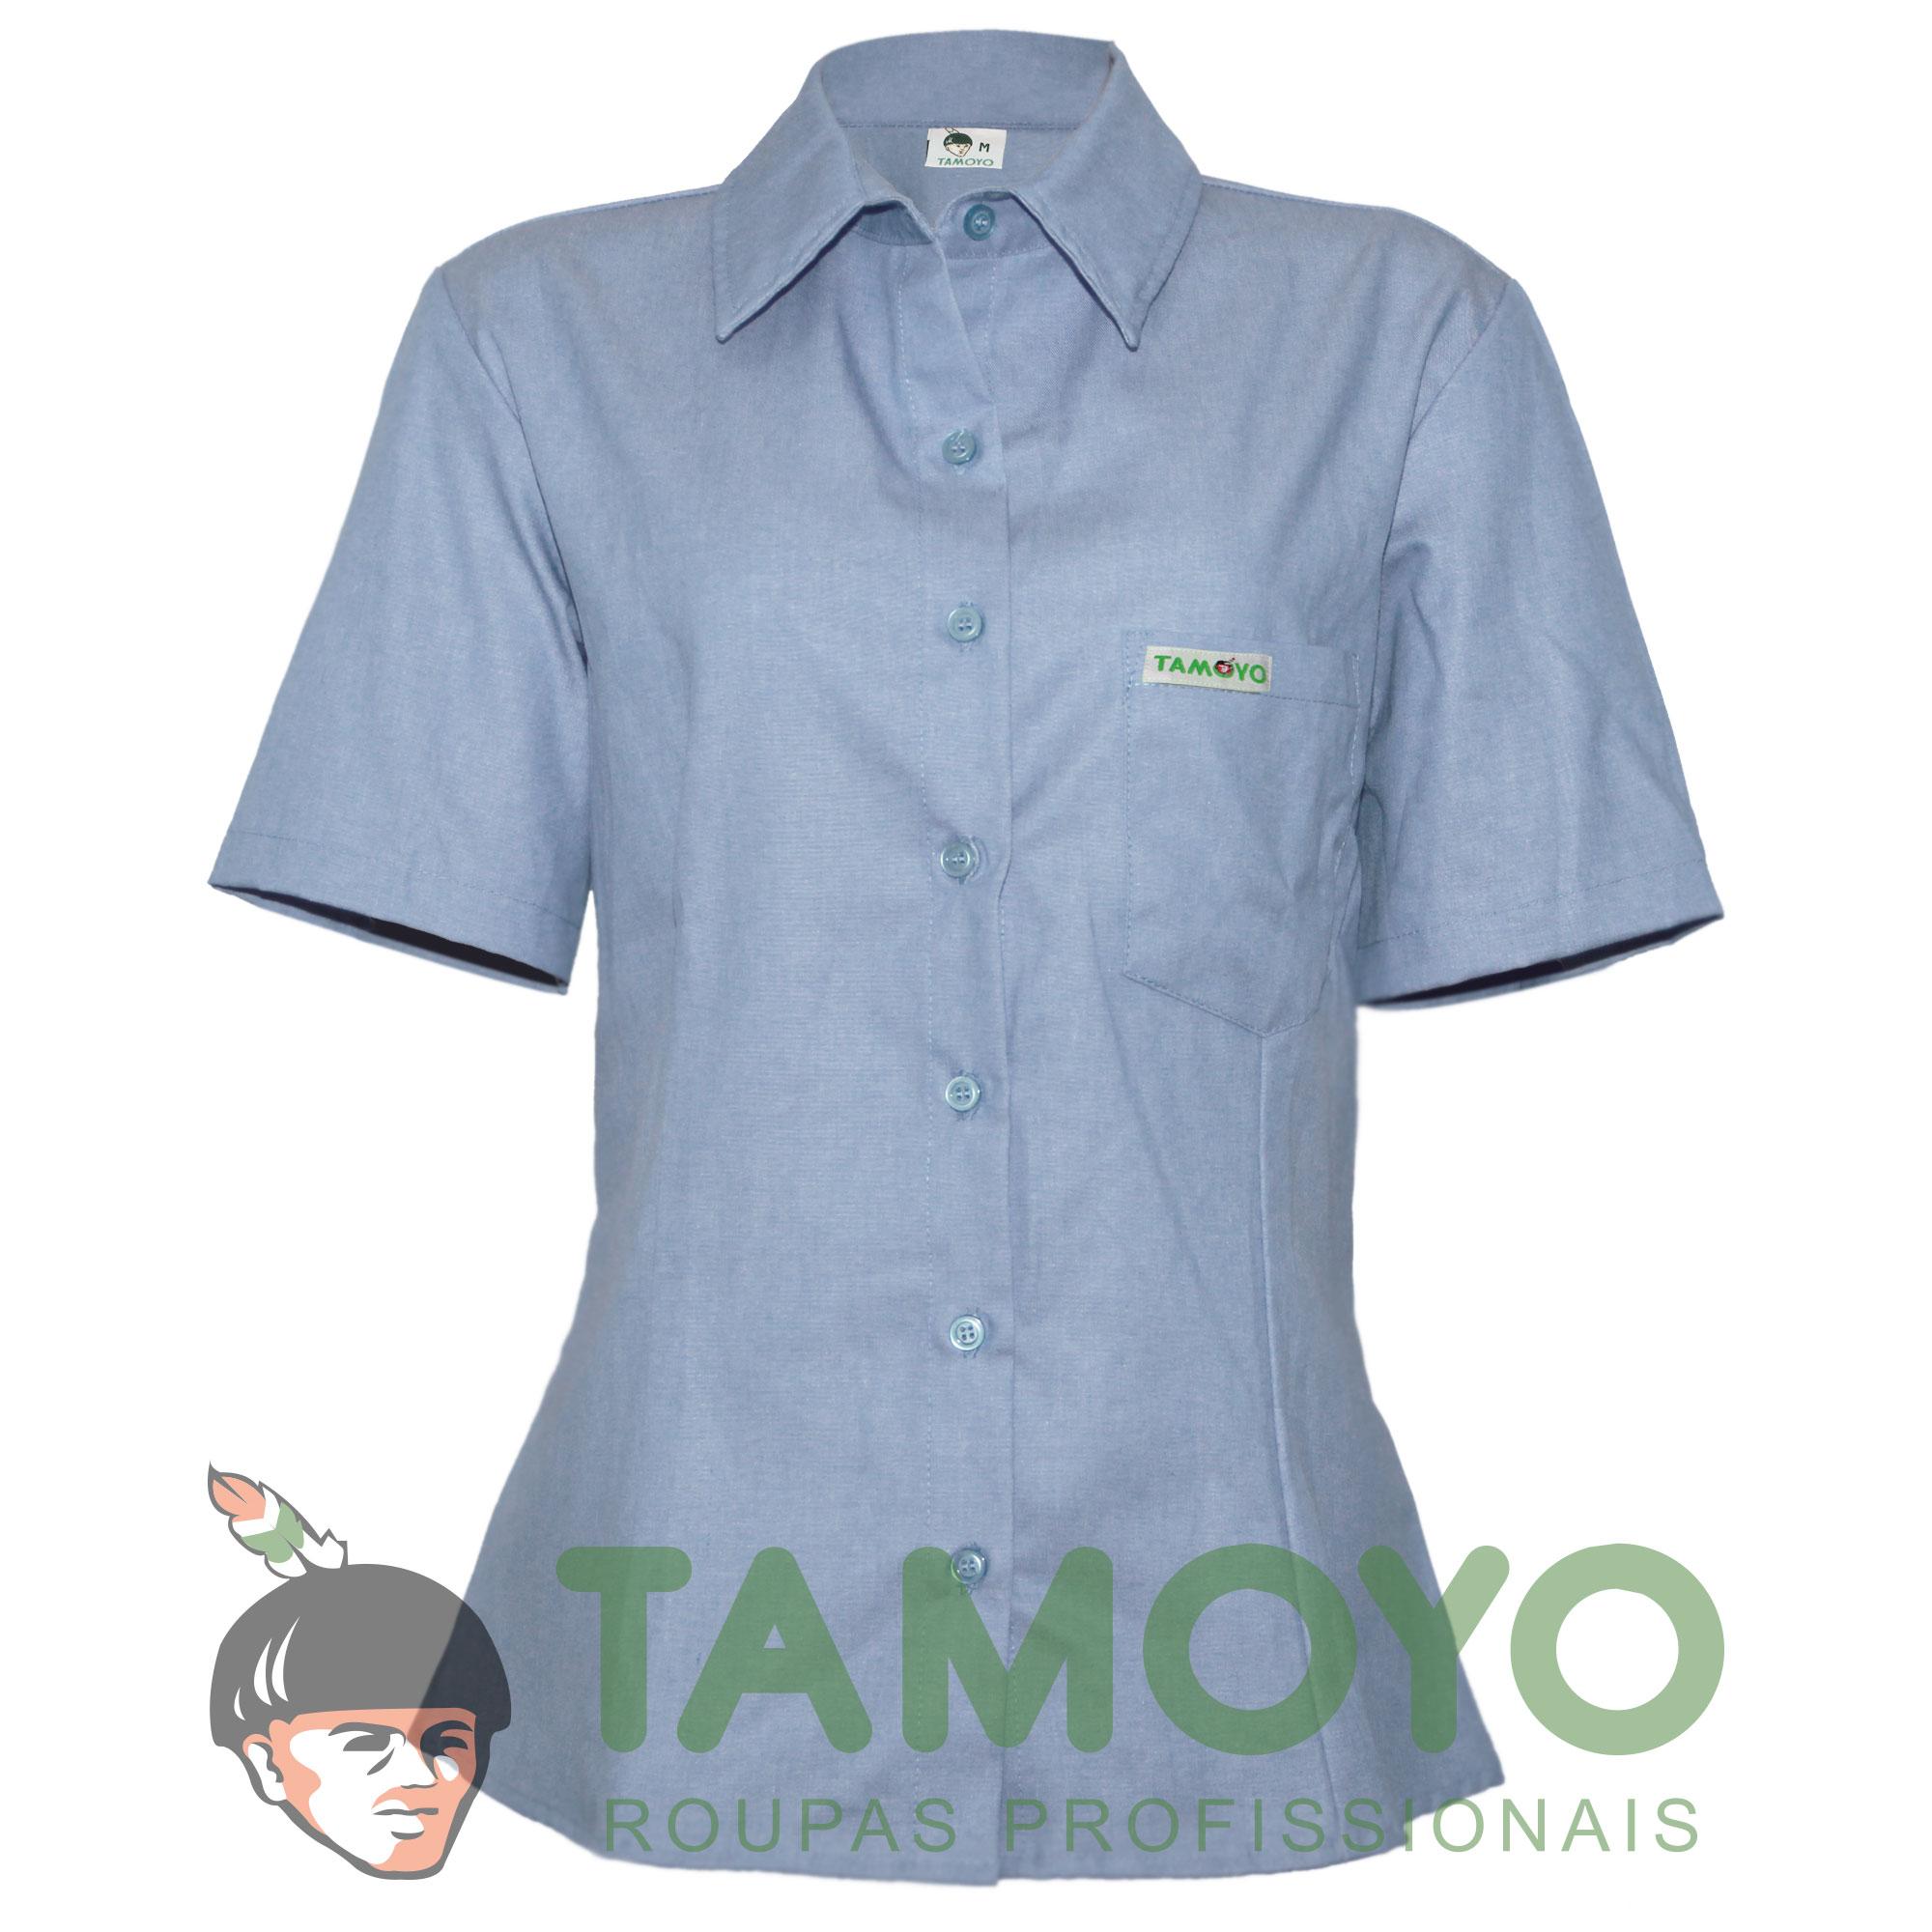 rede-postos-combustivel-roupas-tamoyo-camisete-promotor-frente-2